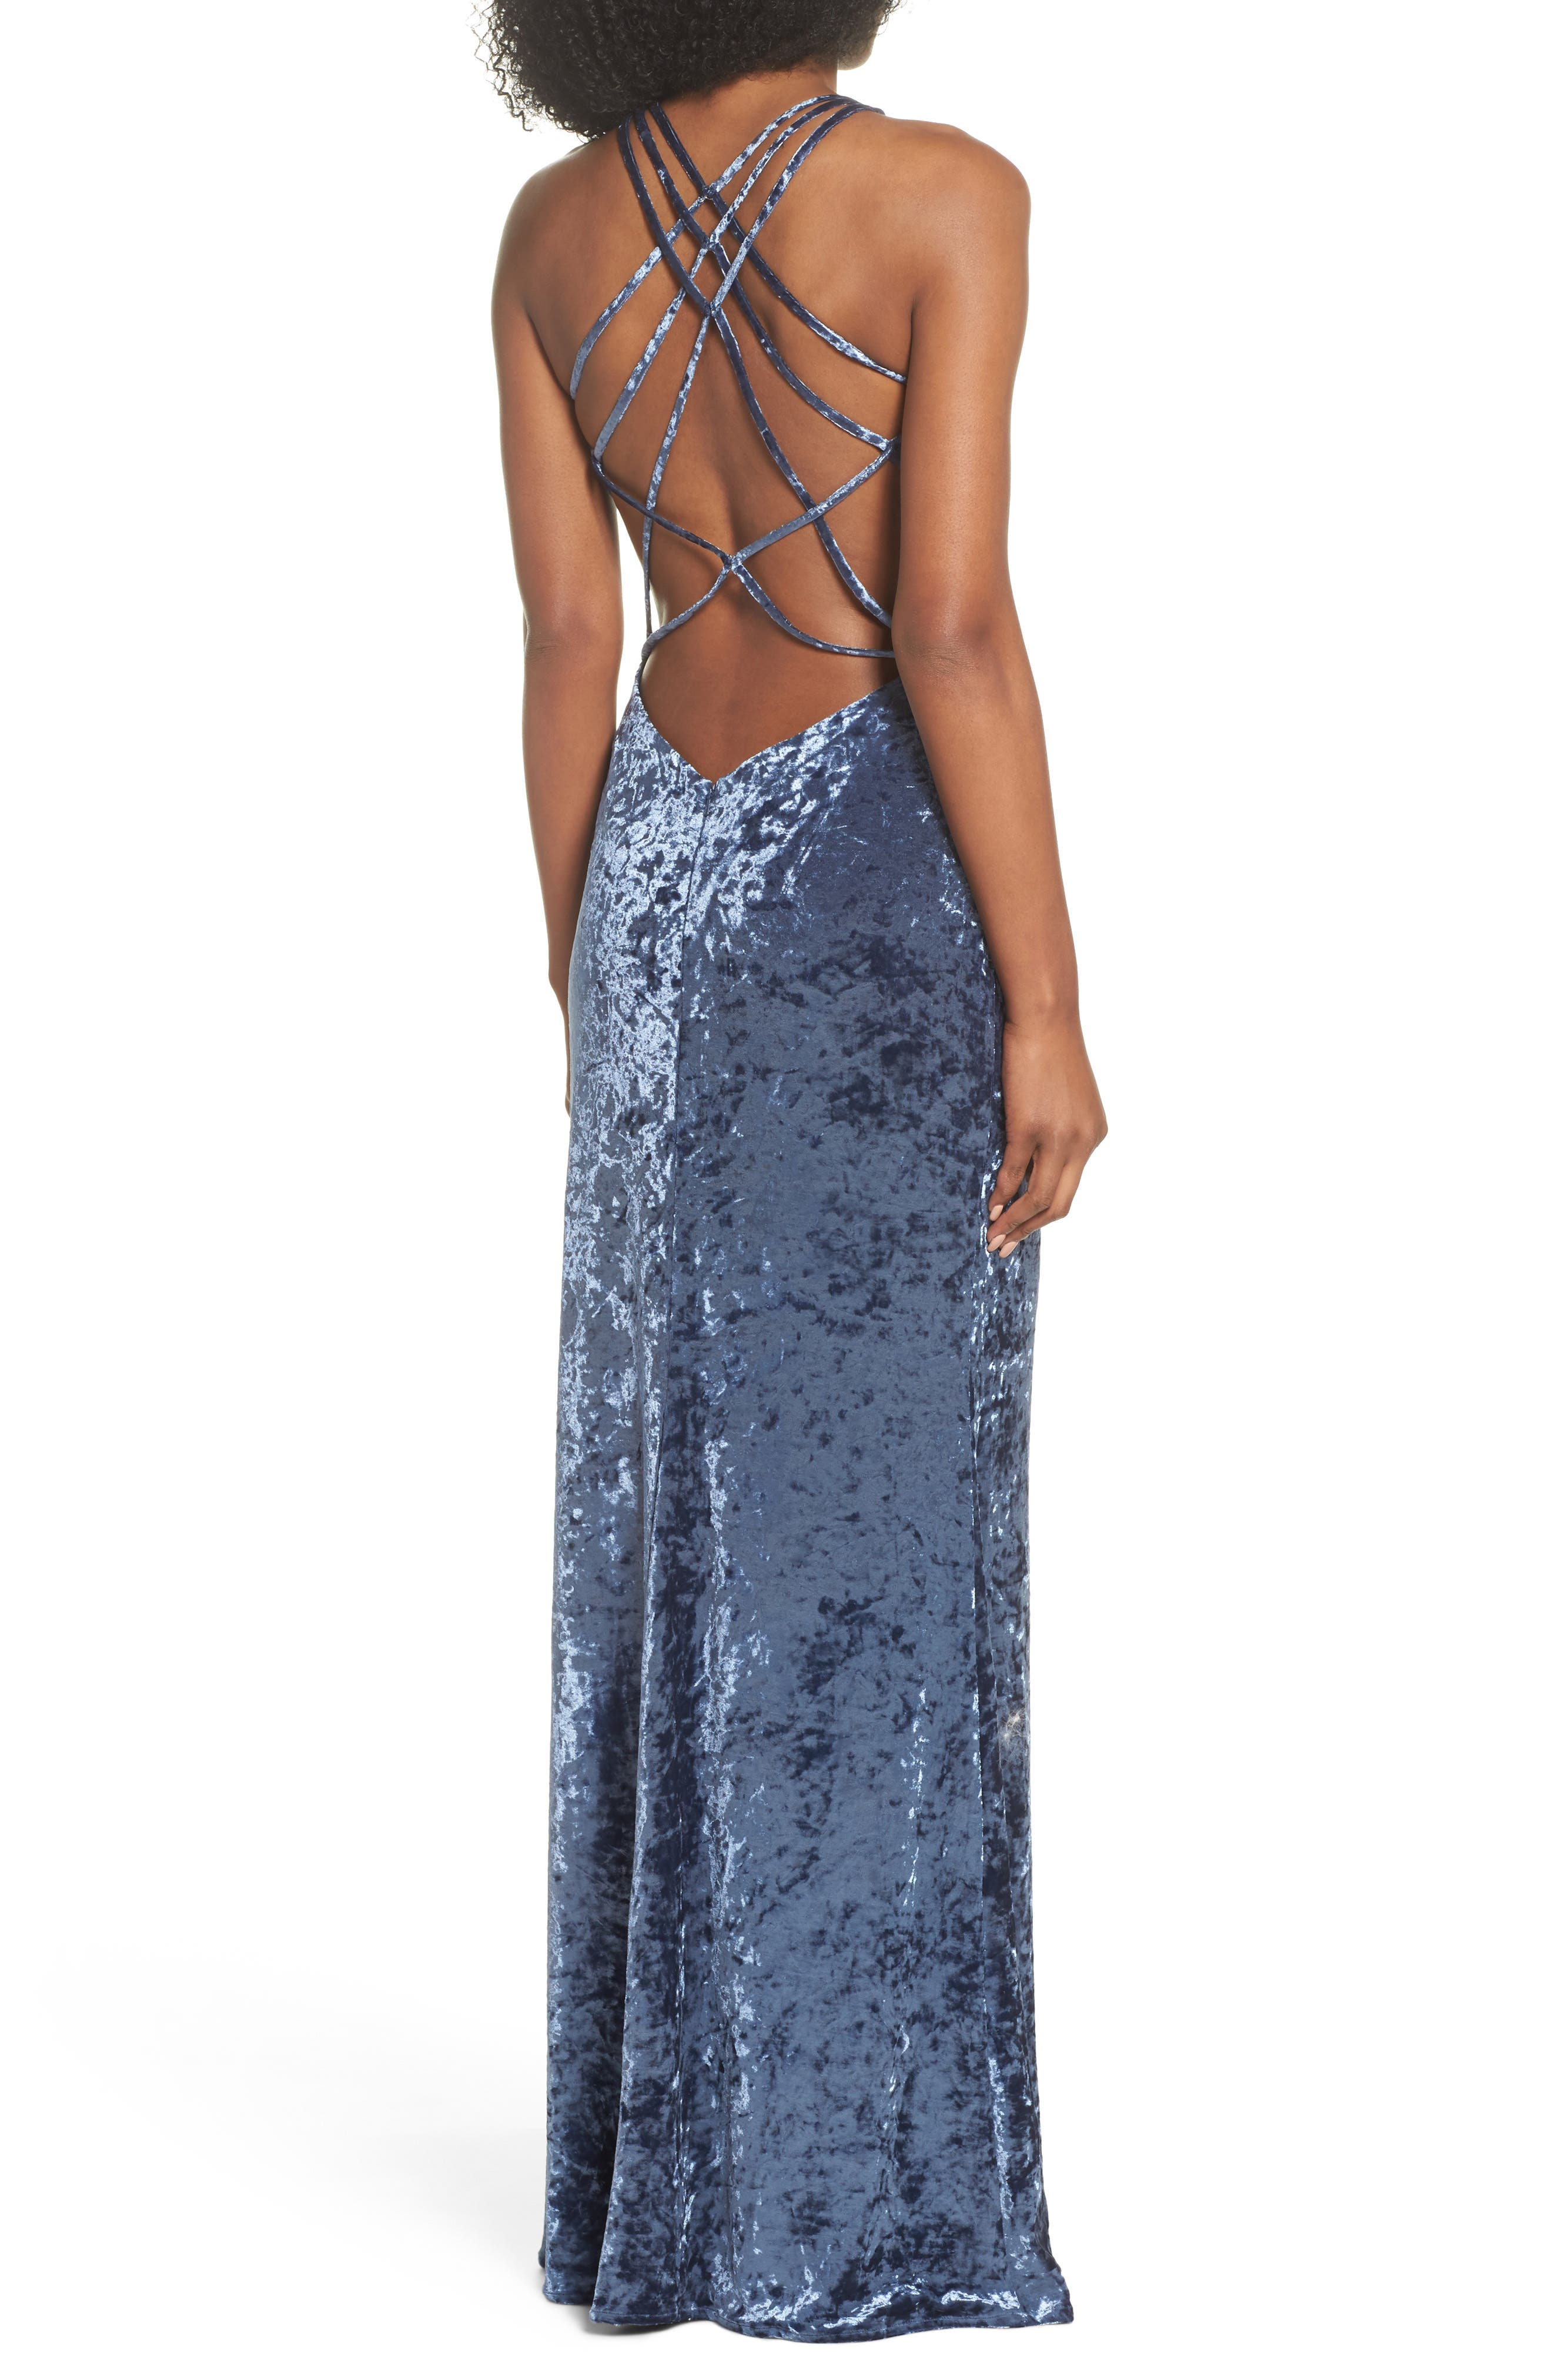 Strappy Crushed Velvet Gown,                             Alternate thumbnail 2, color,                             SLATE BLUE